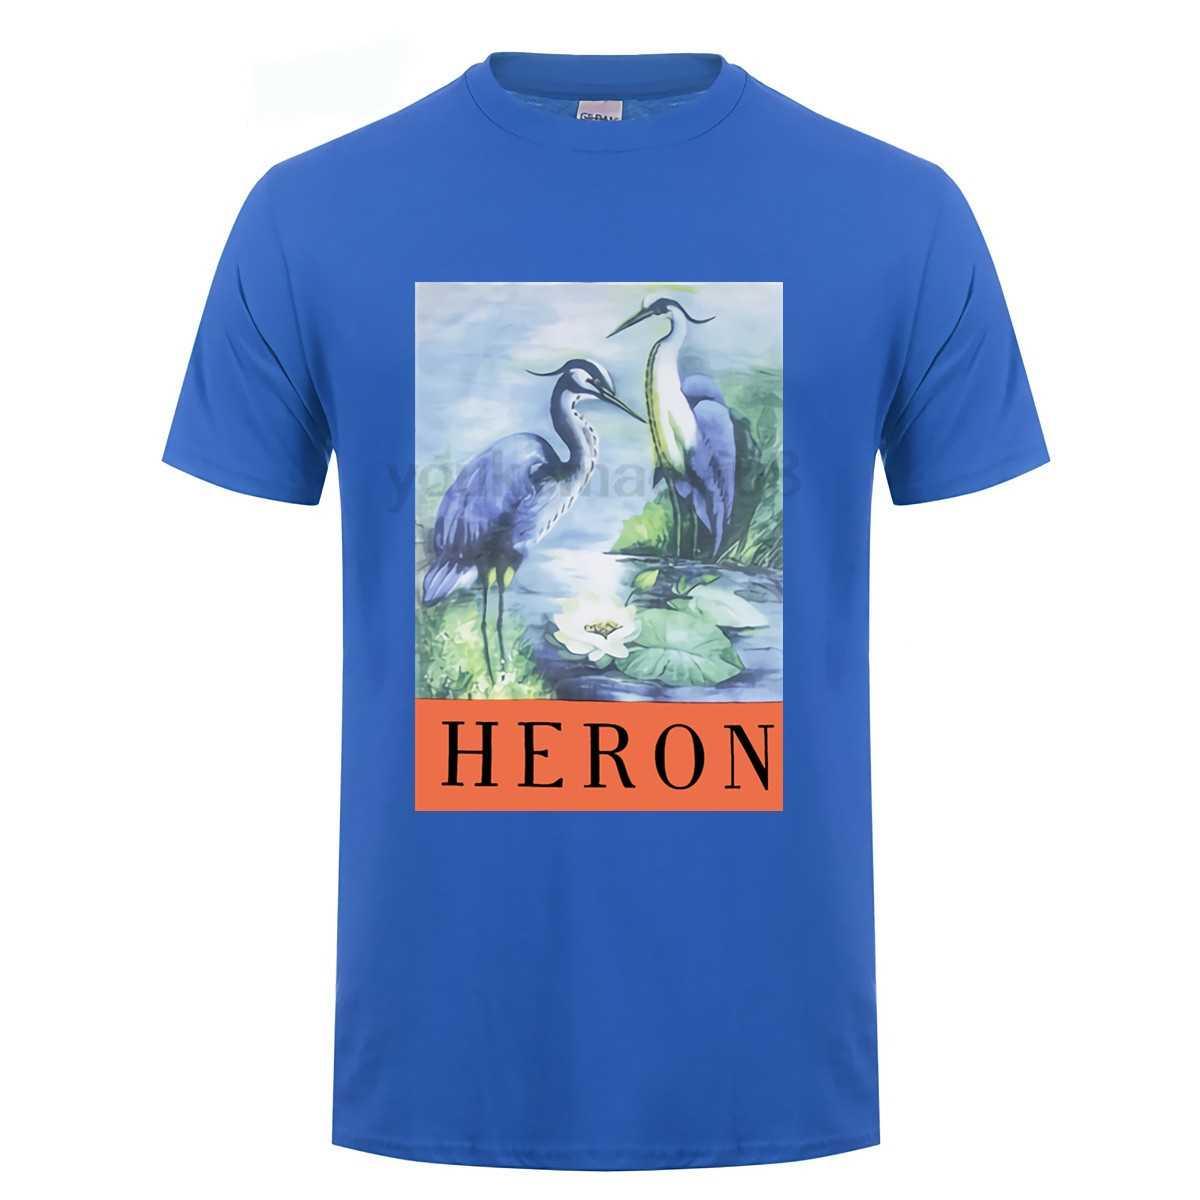 Miglior 1 1 Versione HERON PRESTON enclusion Estate Stampato Donna Uomo футболки хип-хоп Уличная одежда Uomo